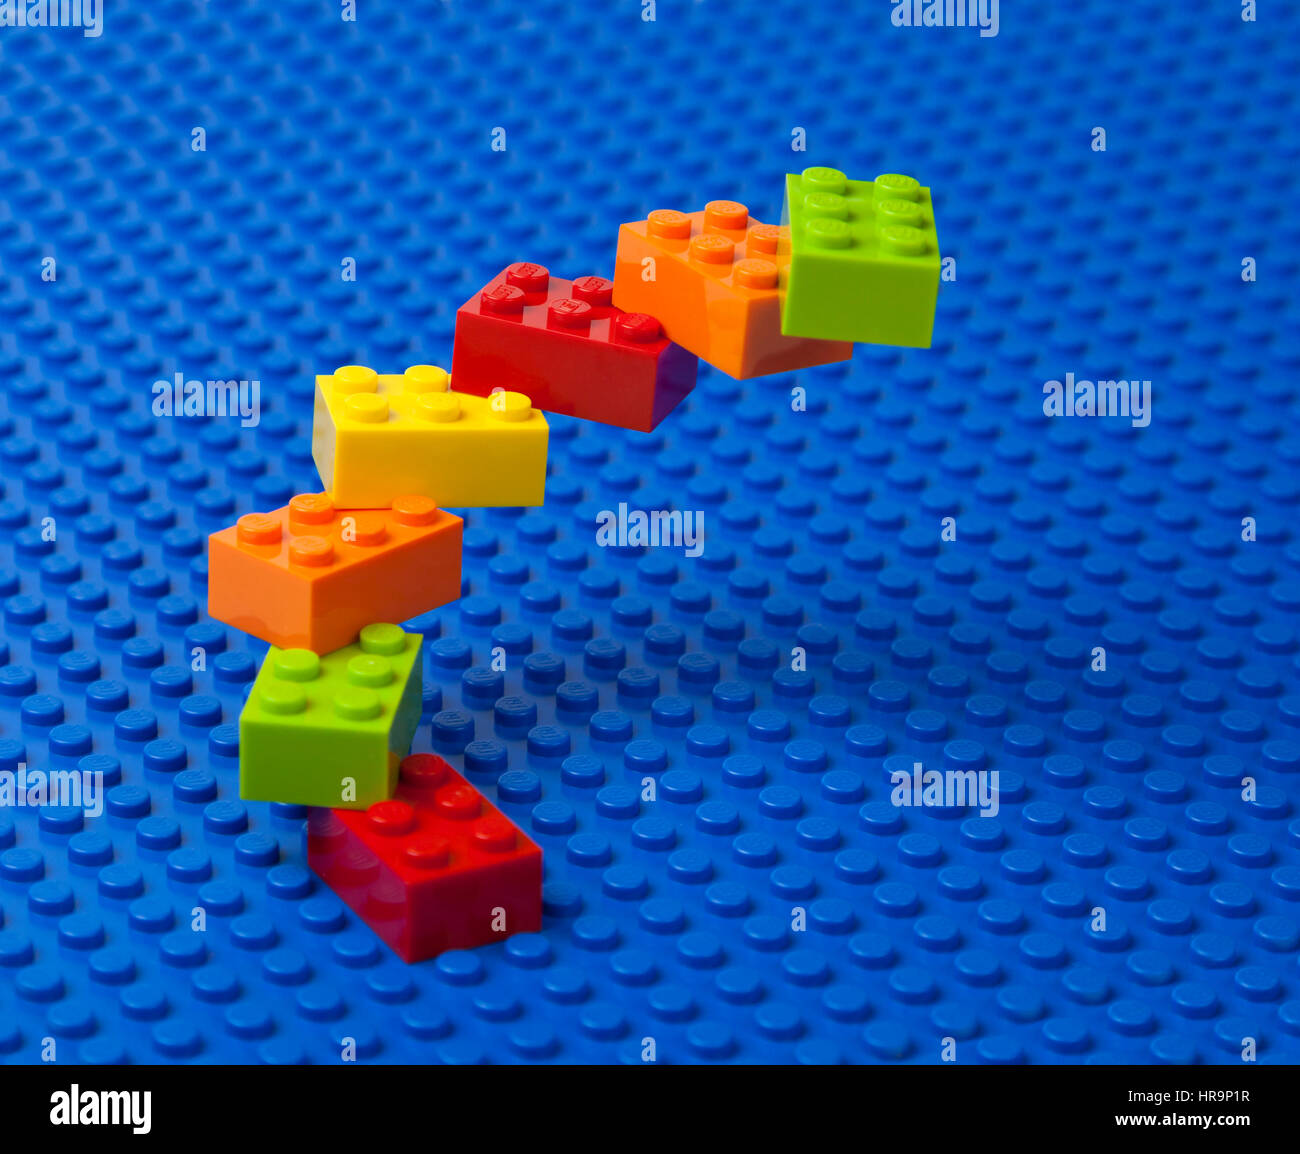 Upward spiral construction or staircase of interlocking Lego bricks on a blue Lego base plate. Stock Photo